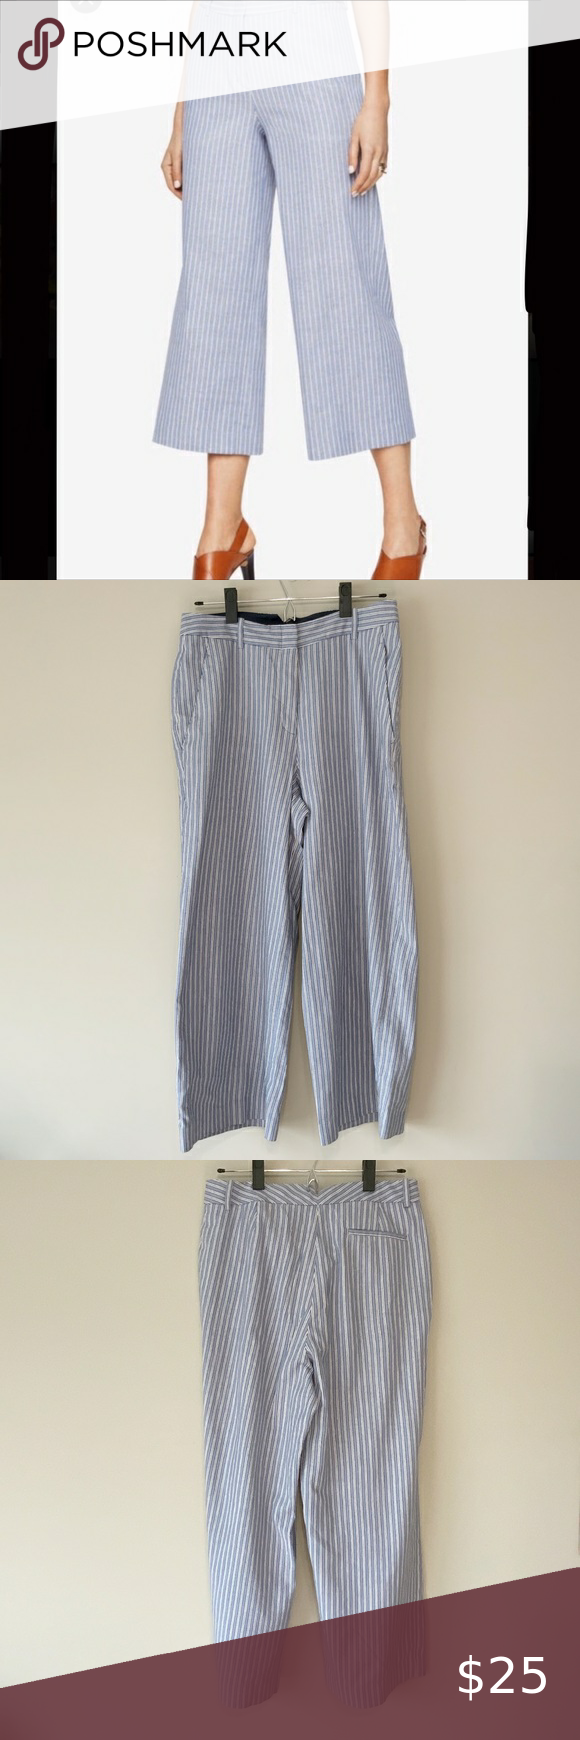 Photo of BCBG MaxAzria Sutton Striped Wide Leg Pant BCBG MaxAzria Sutton Striped Wide Leg…